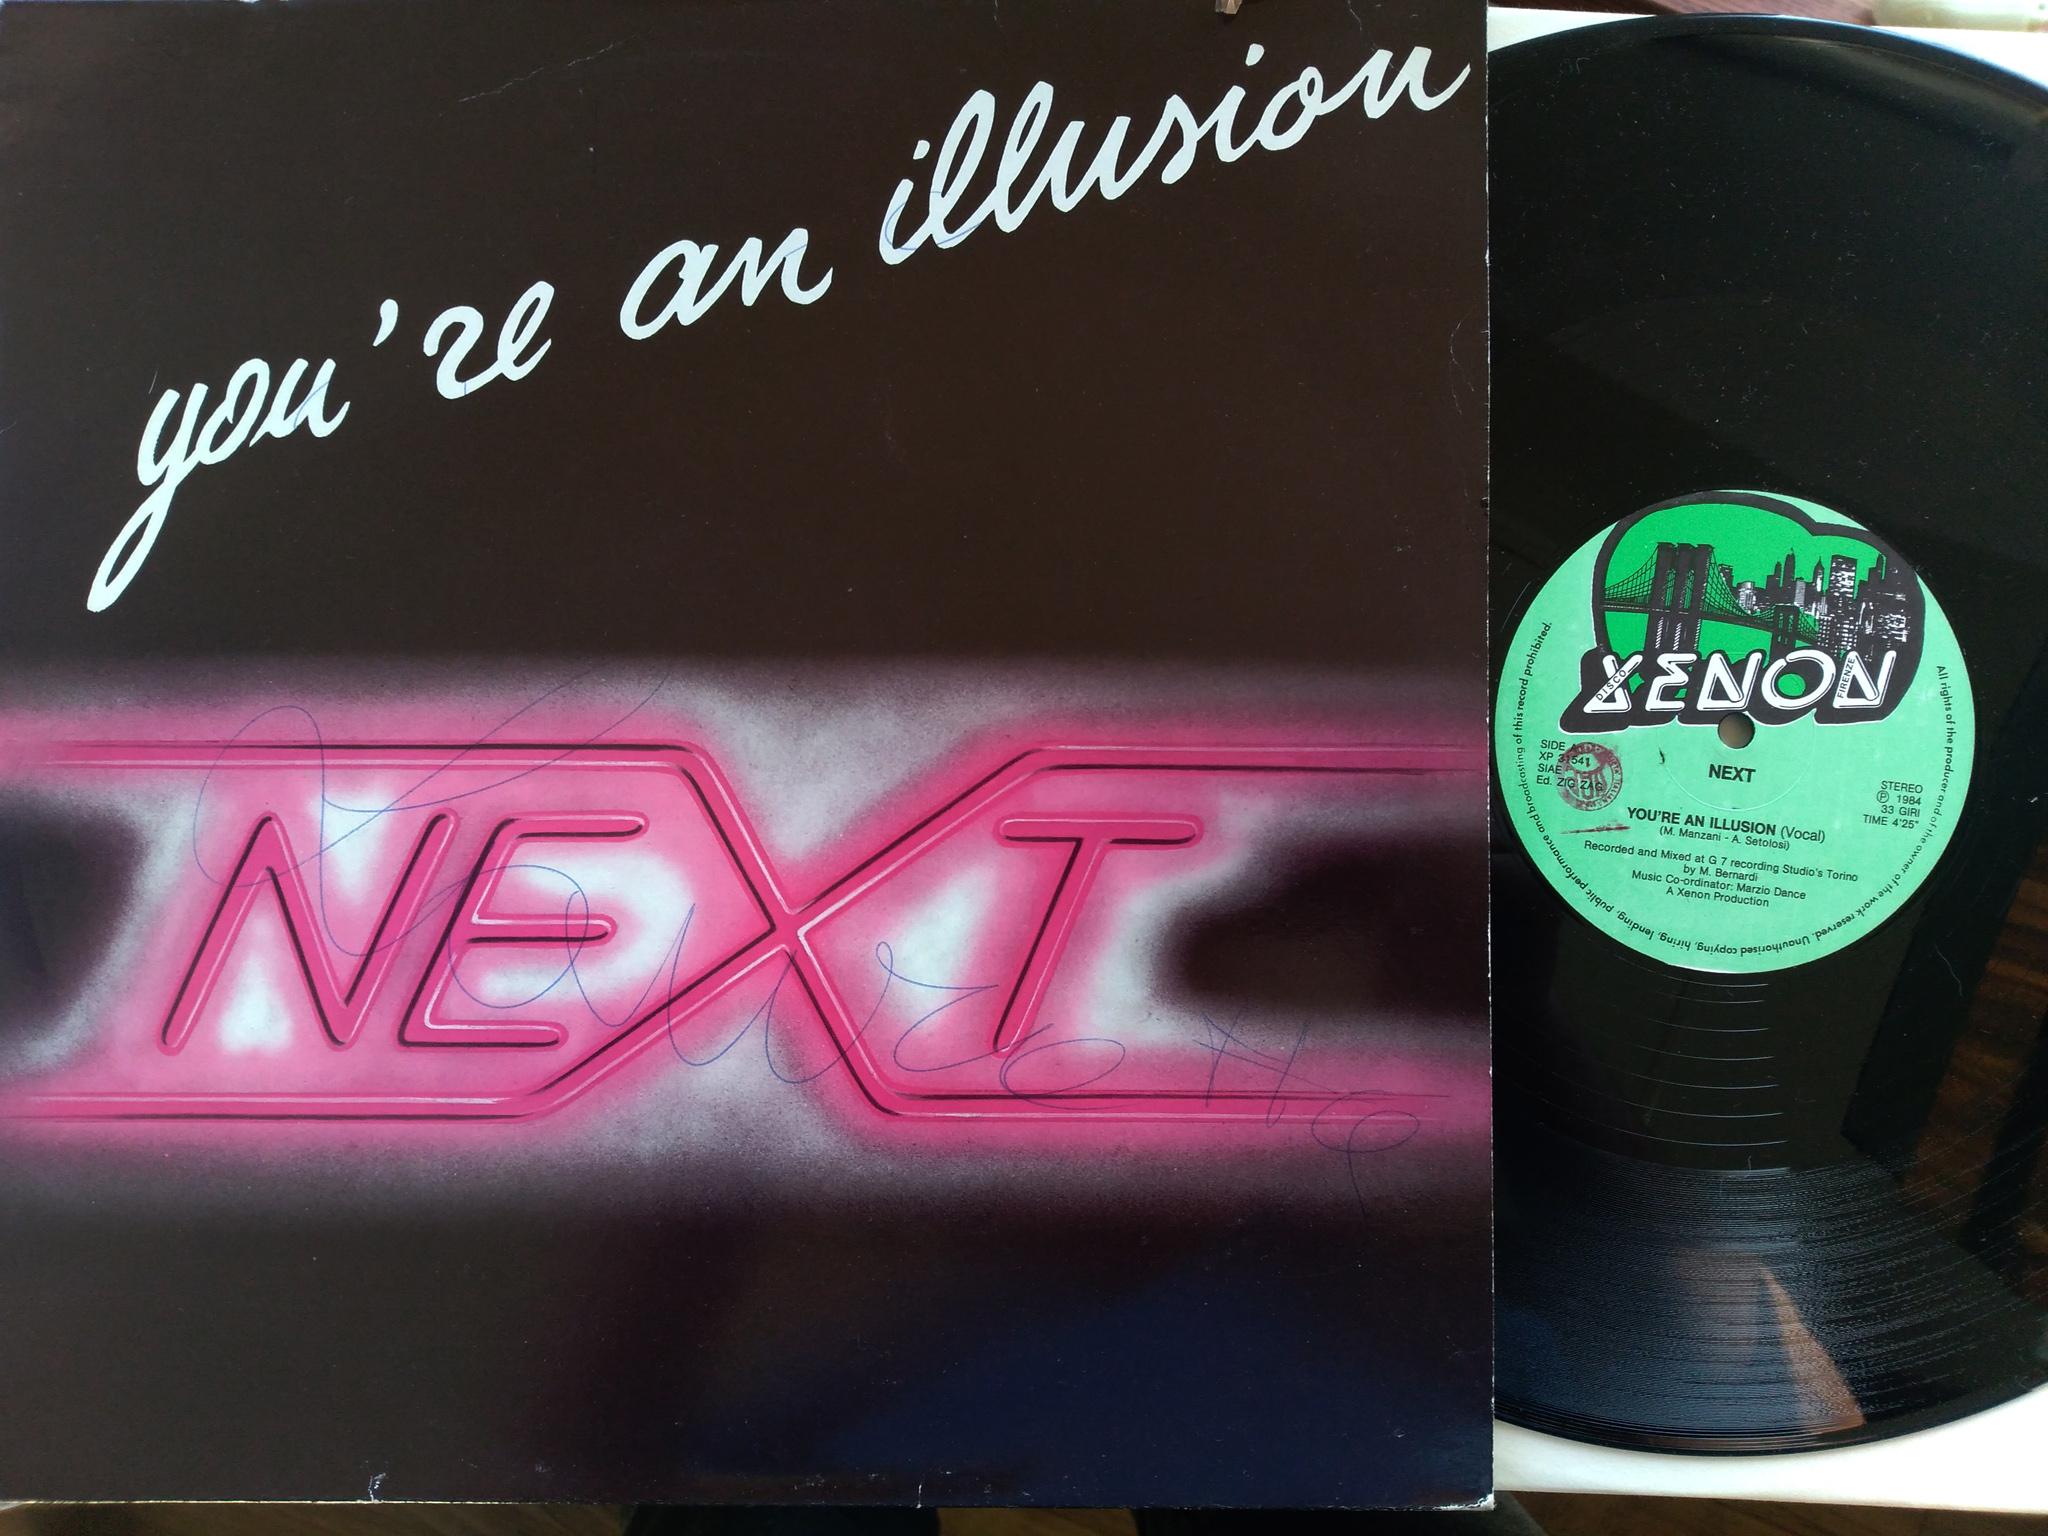 Next - You're An Illusion